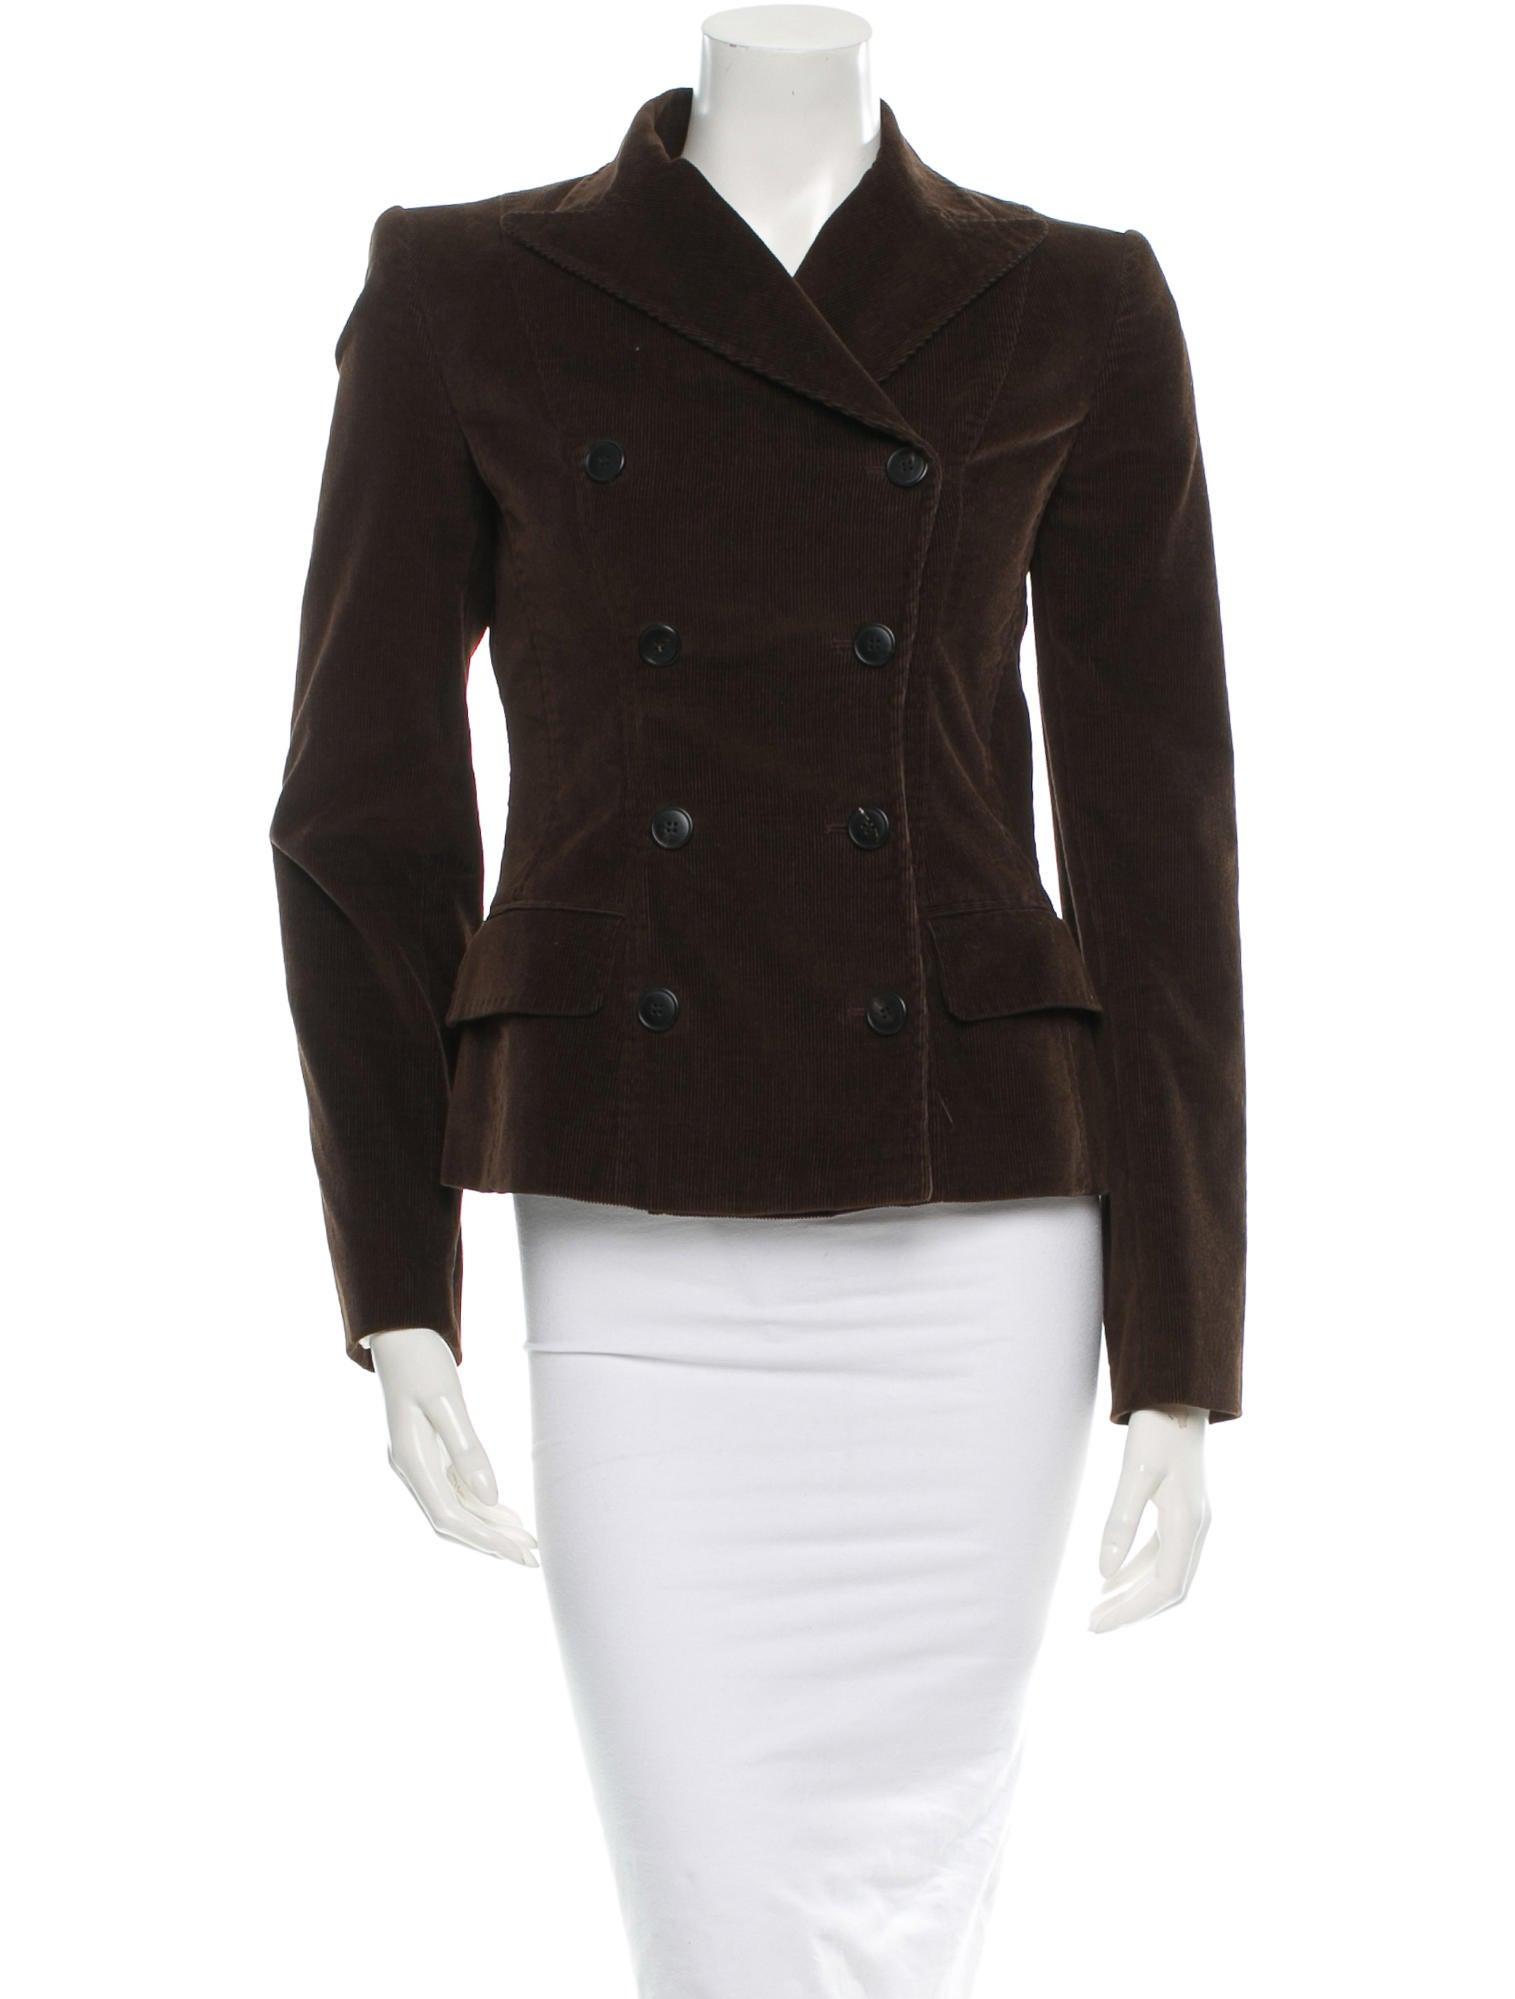 dolce gabbana jacket clothing dag44853 the realreal. Black Bedroom Furniture Sets. Home Design Ideas